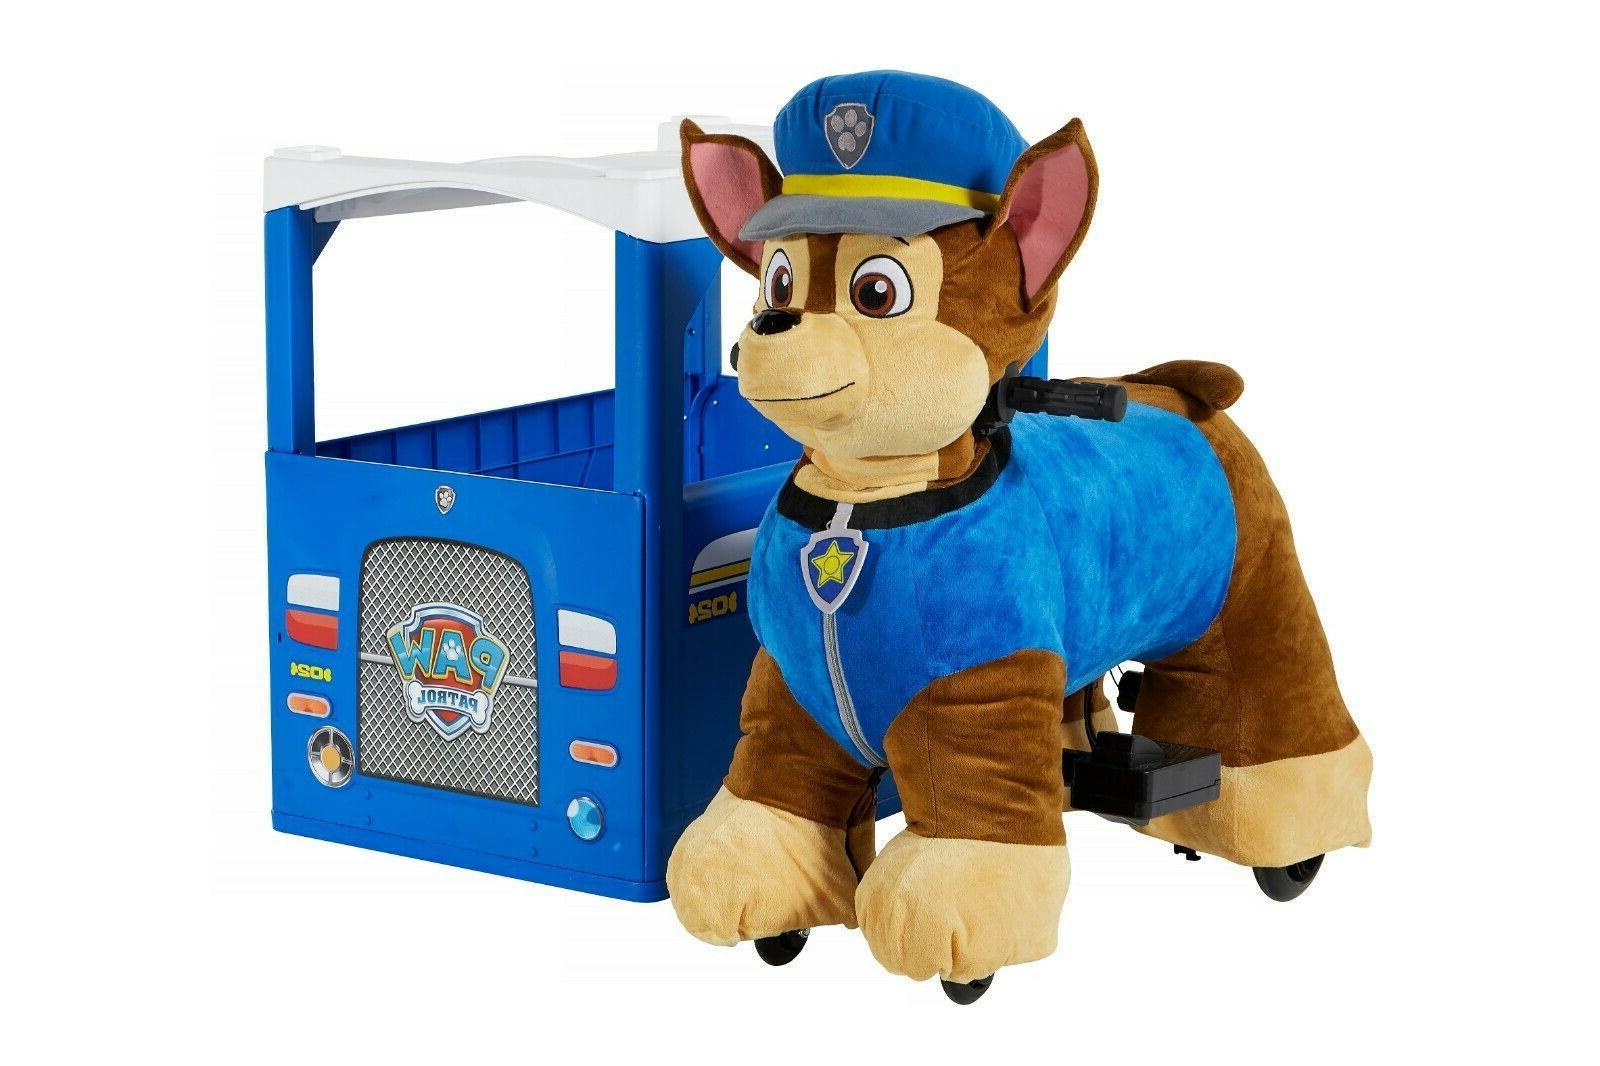 Paw 6Volt Battery Rescue Dog House Kids Sound